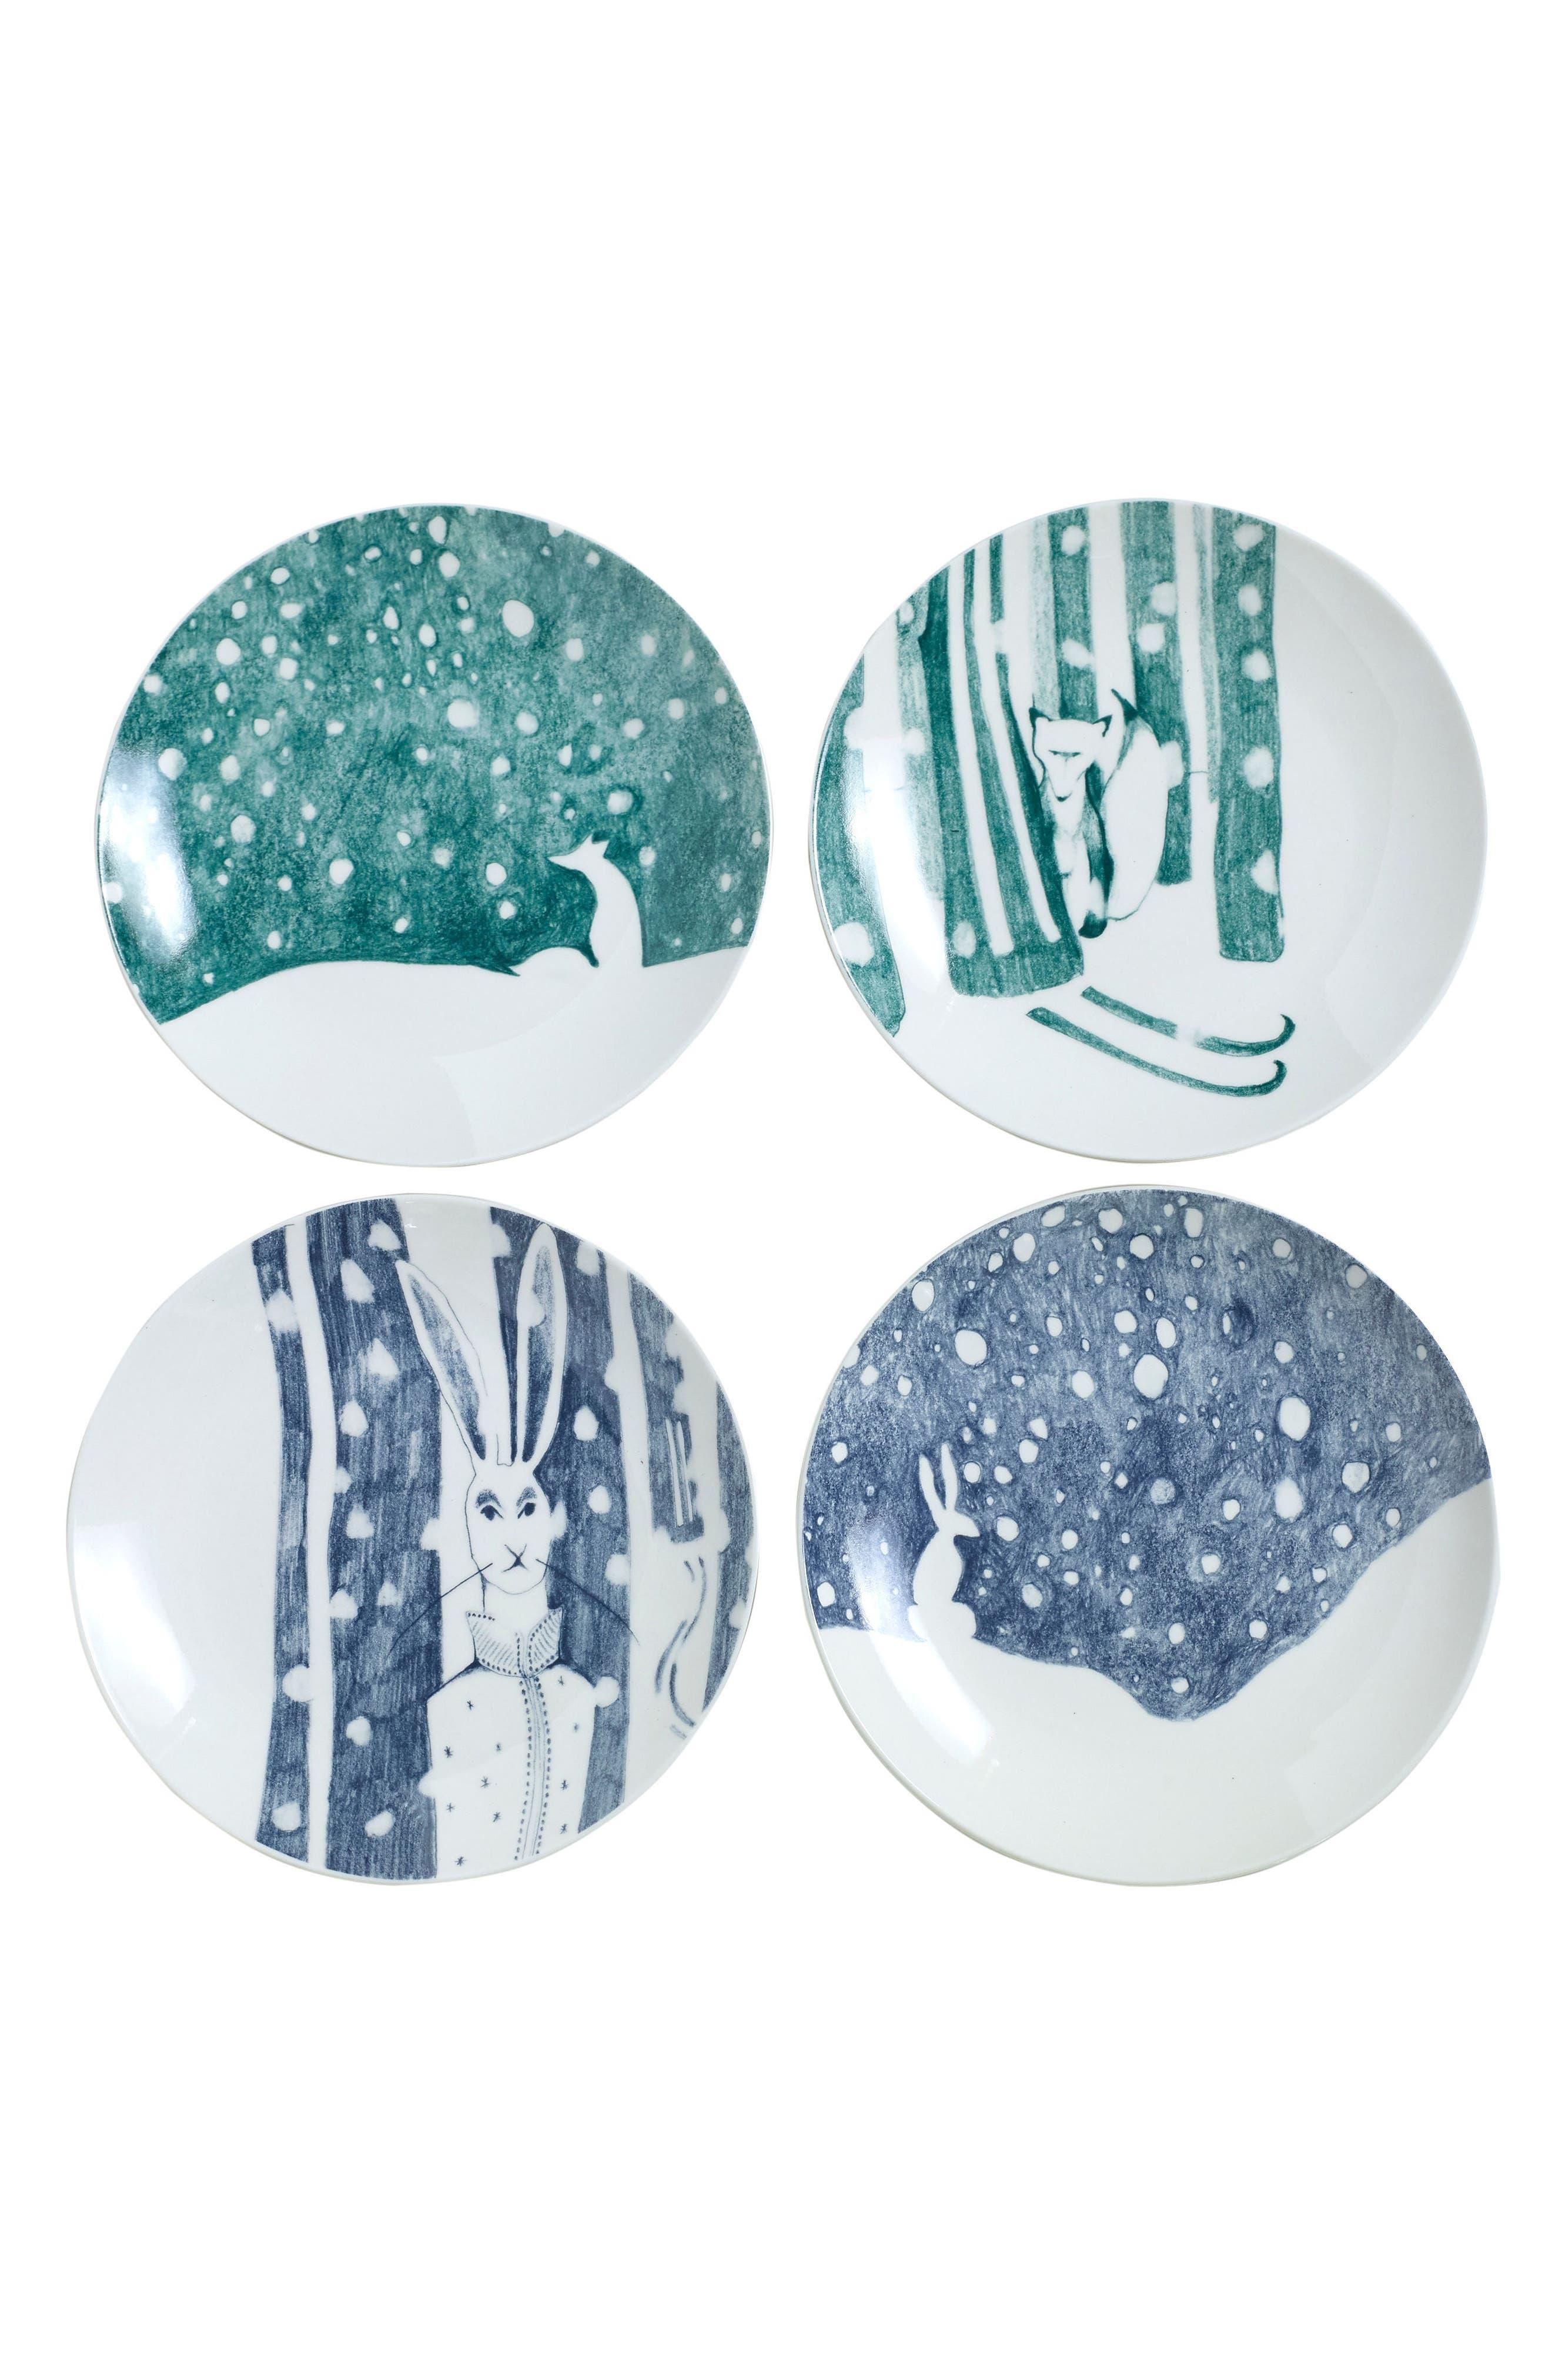 Accent Decor Eric & Eloise Forest Set of 4 Plates